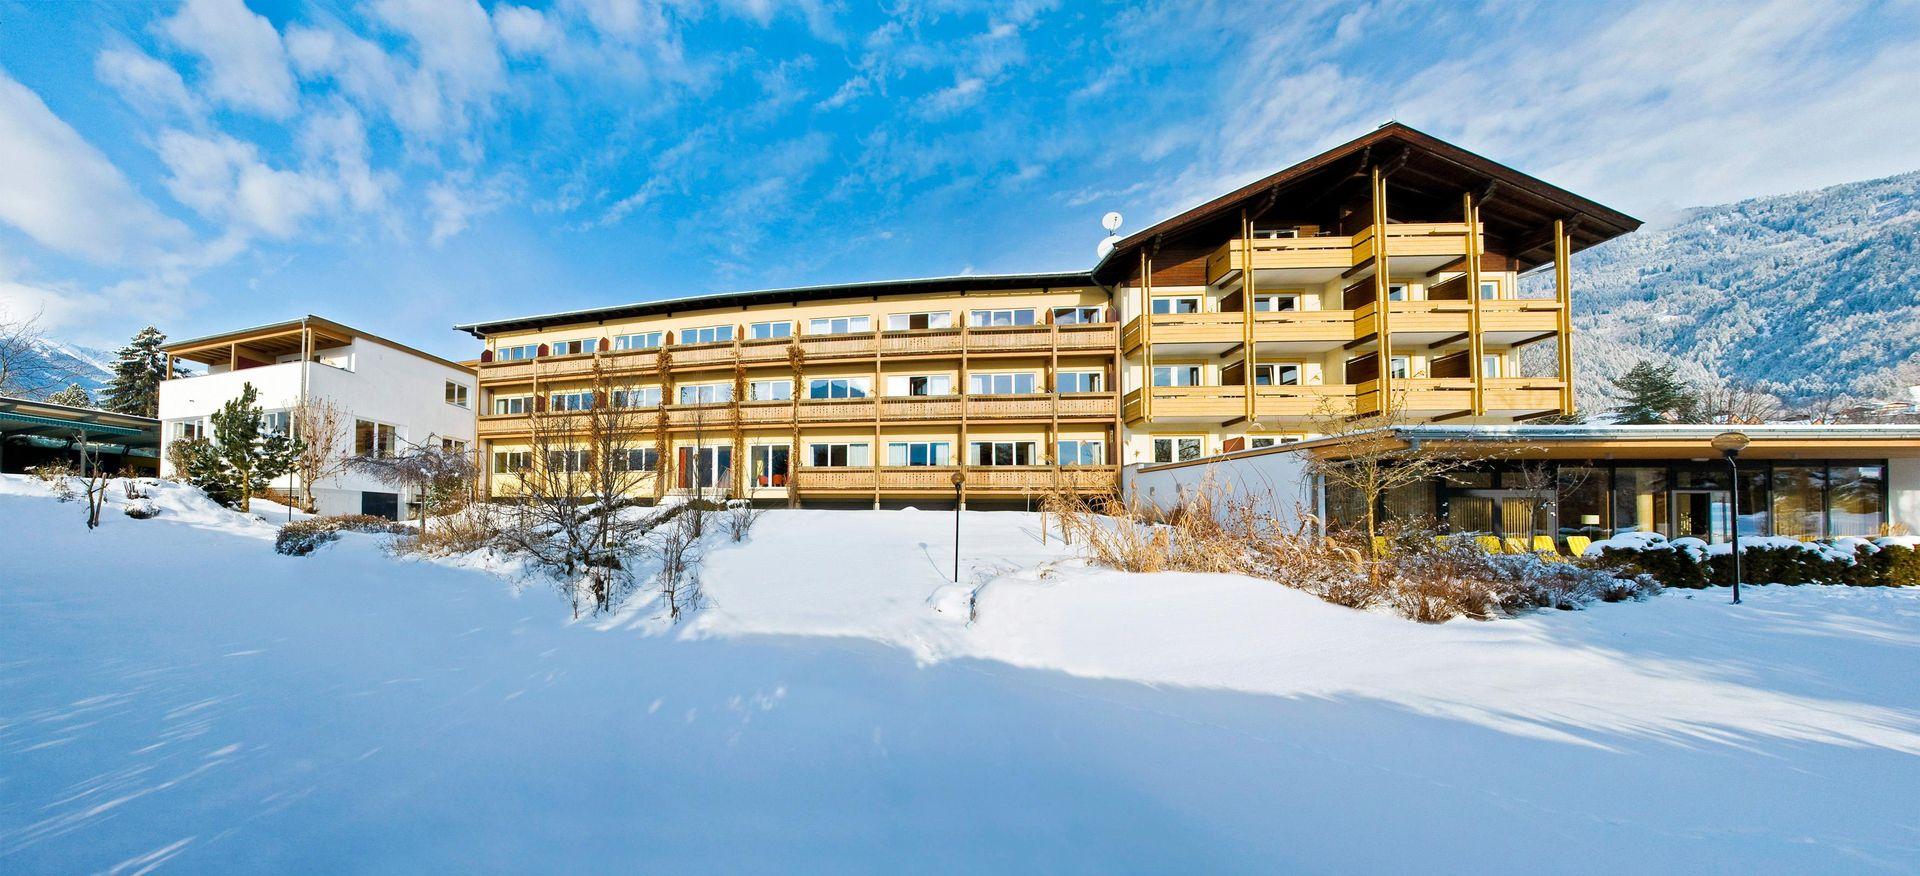 Holiday Hotel Moarhof - Slide 1